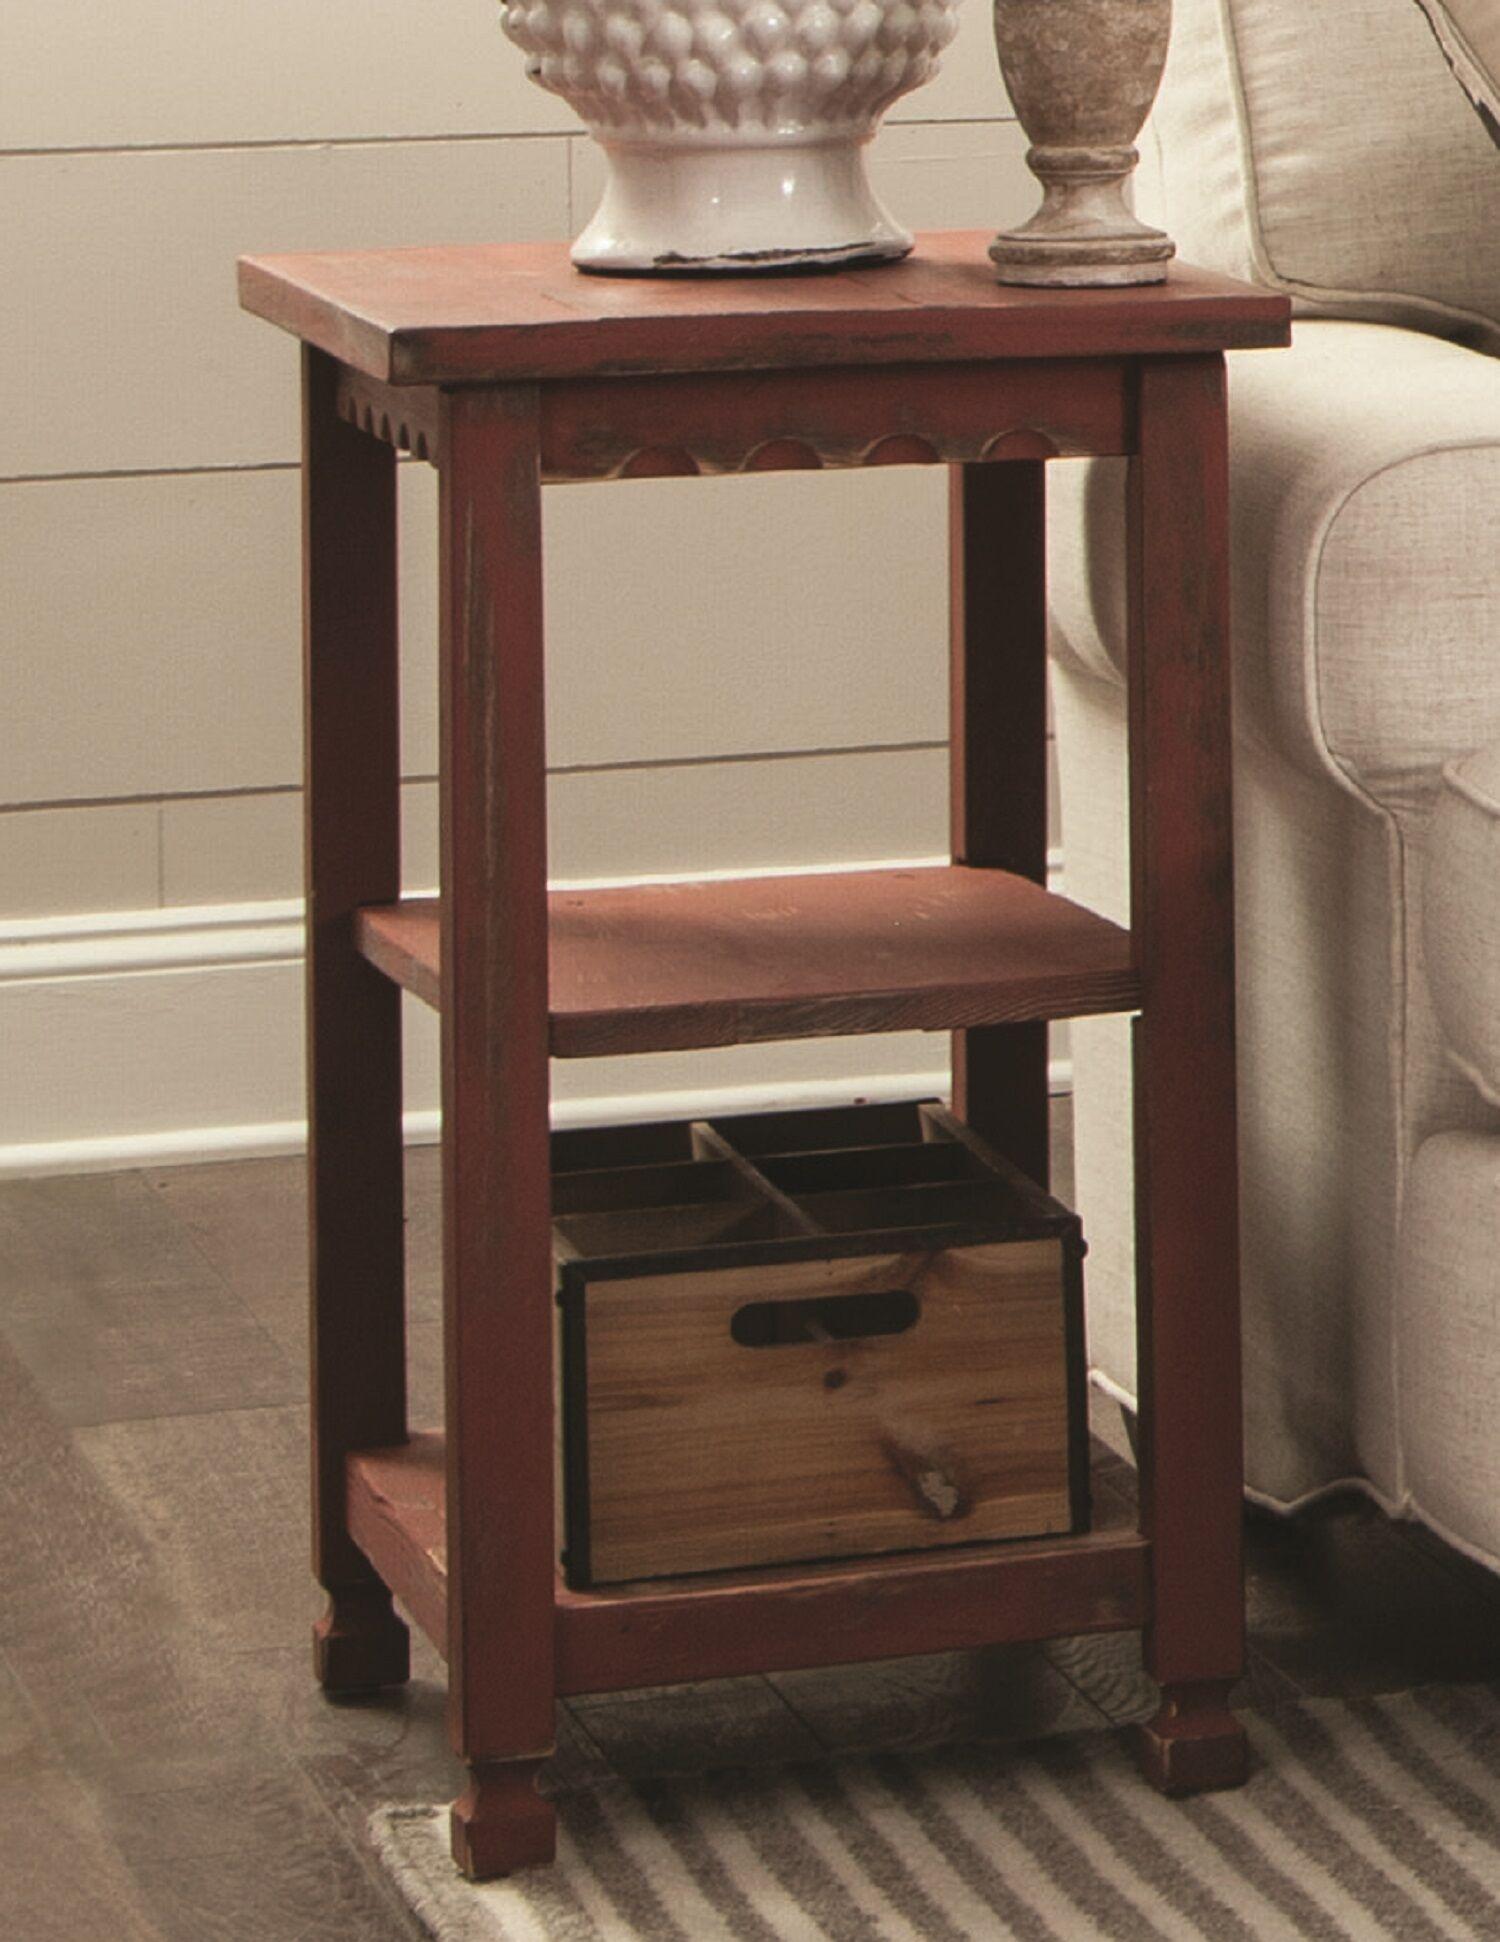 Mangum 2 Shelf End Table Color: Red